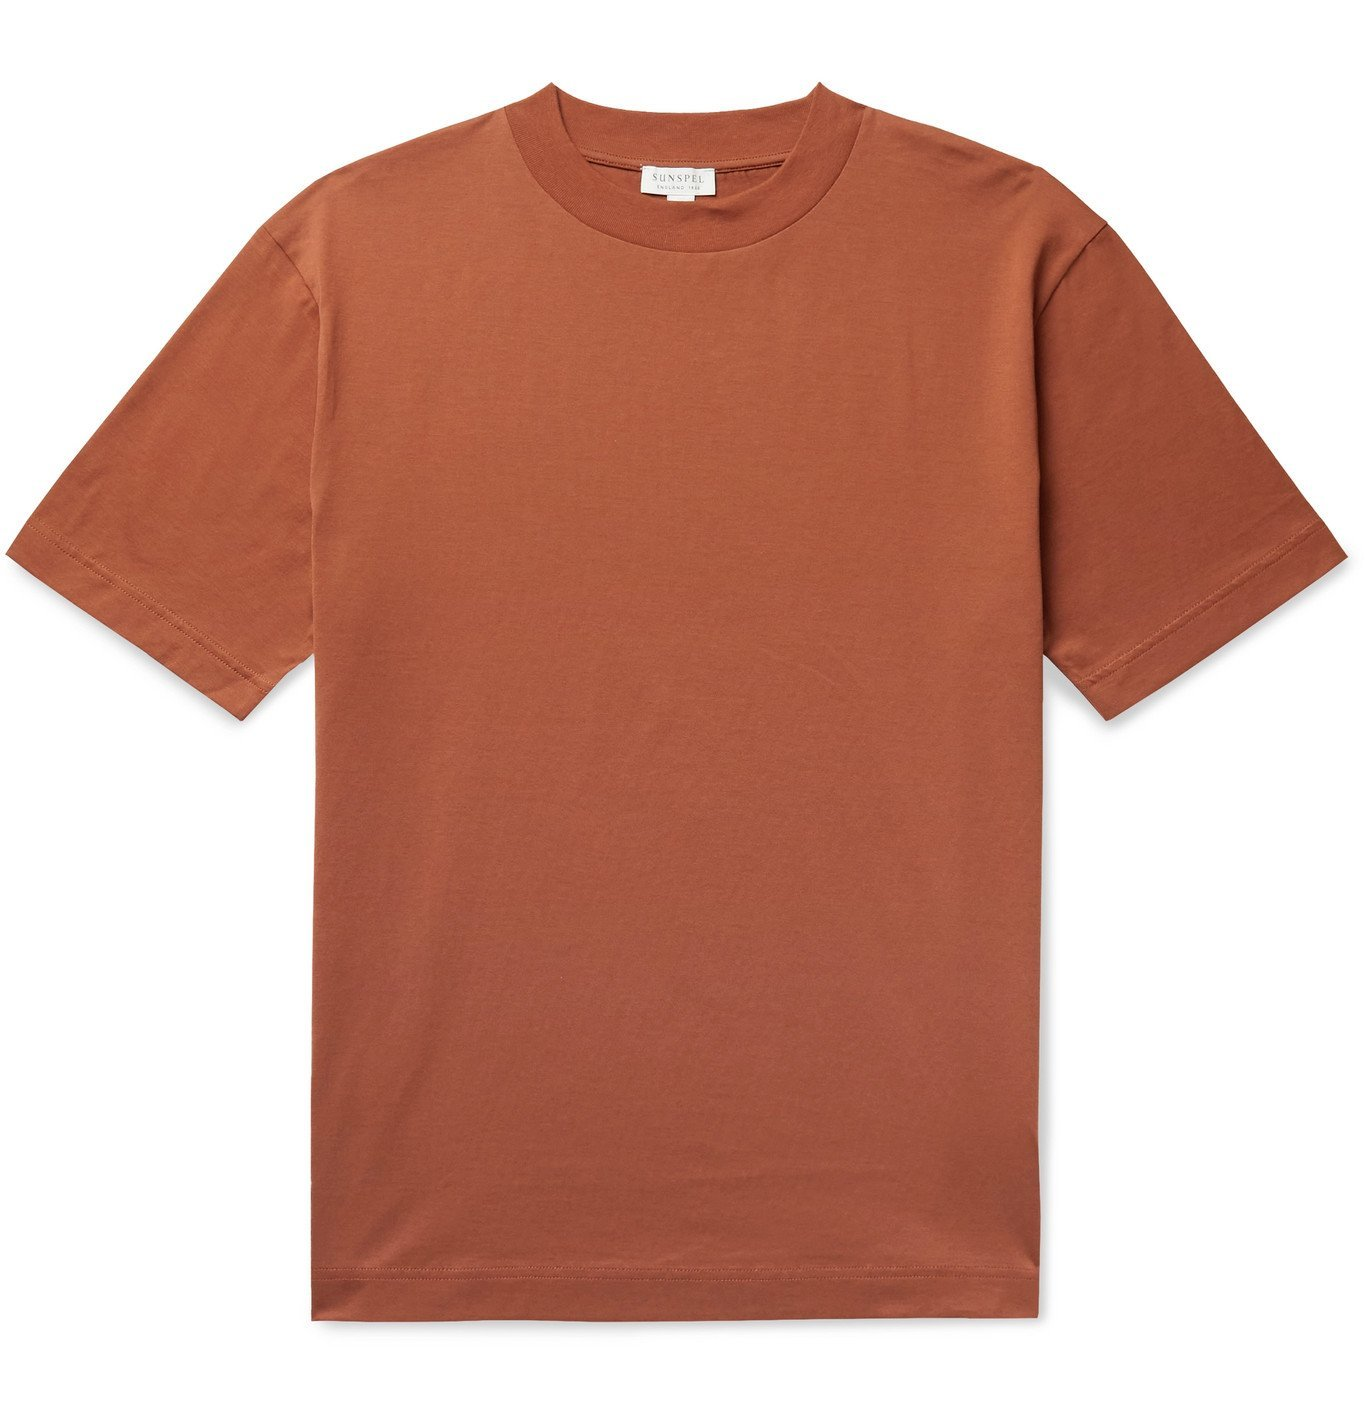 SUNSPEL - Pima Cotton-Jersey T-Shirt - Orange